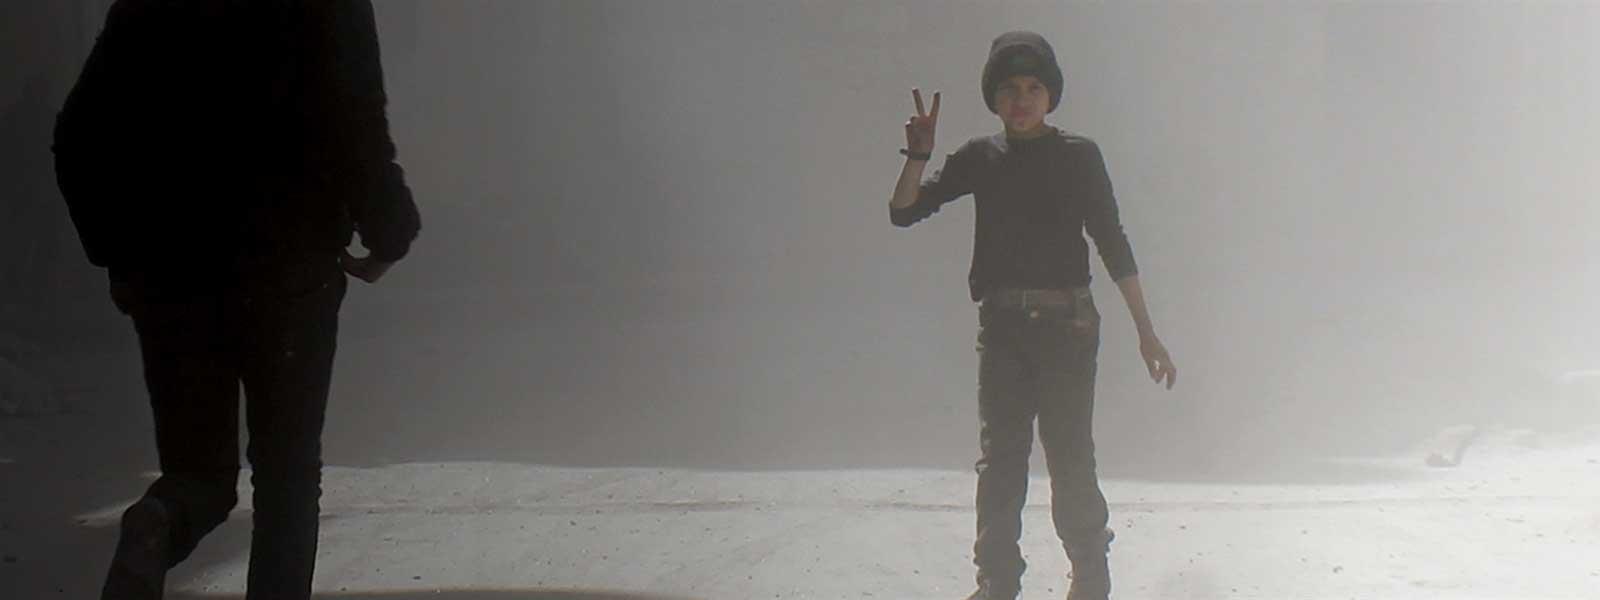 Pro Bono Checking conflicts hero